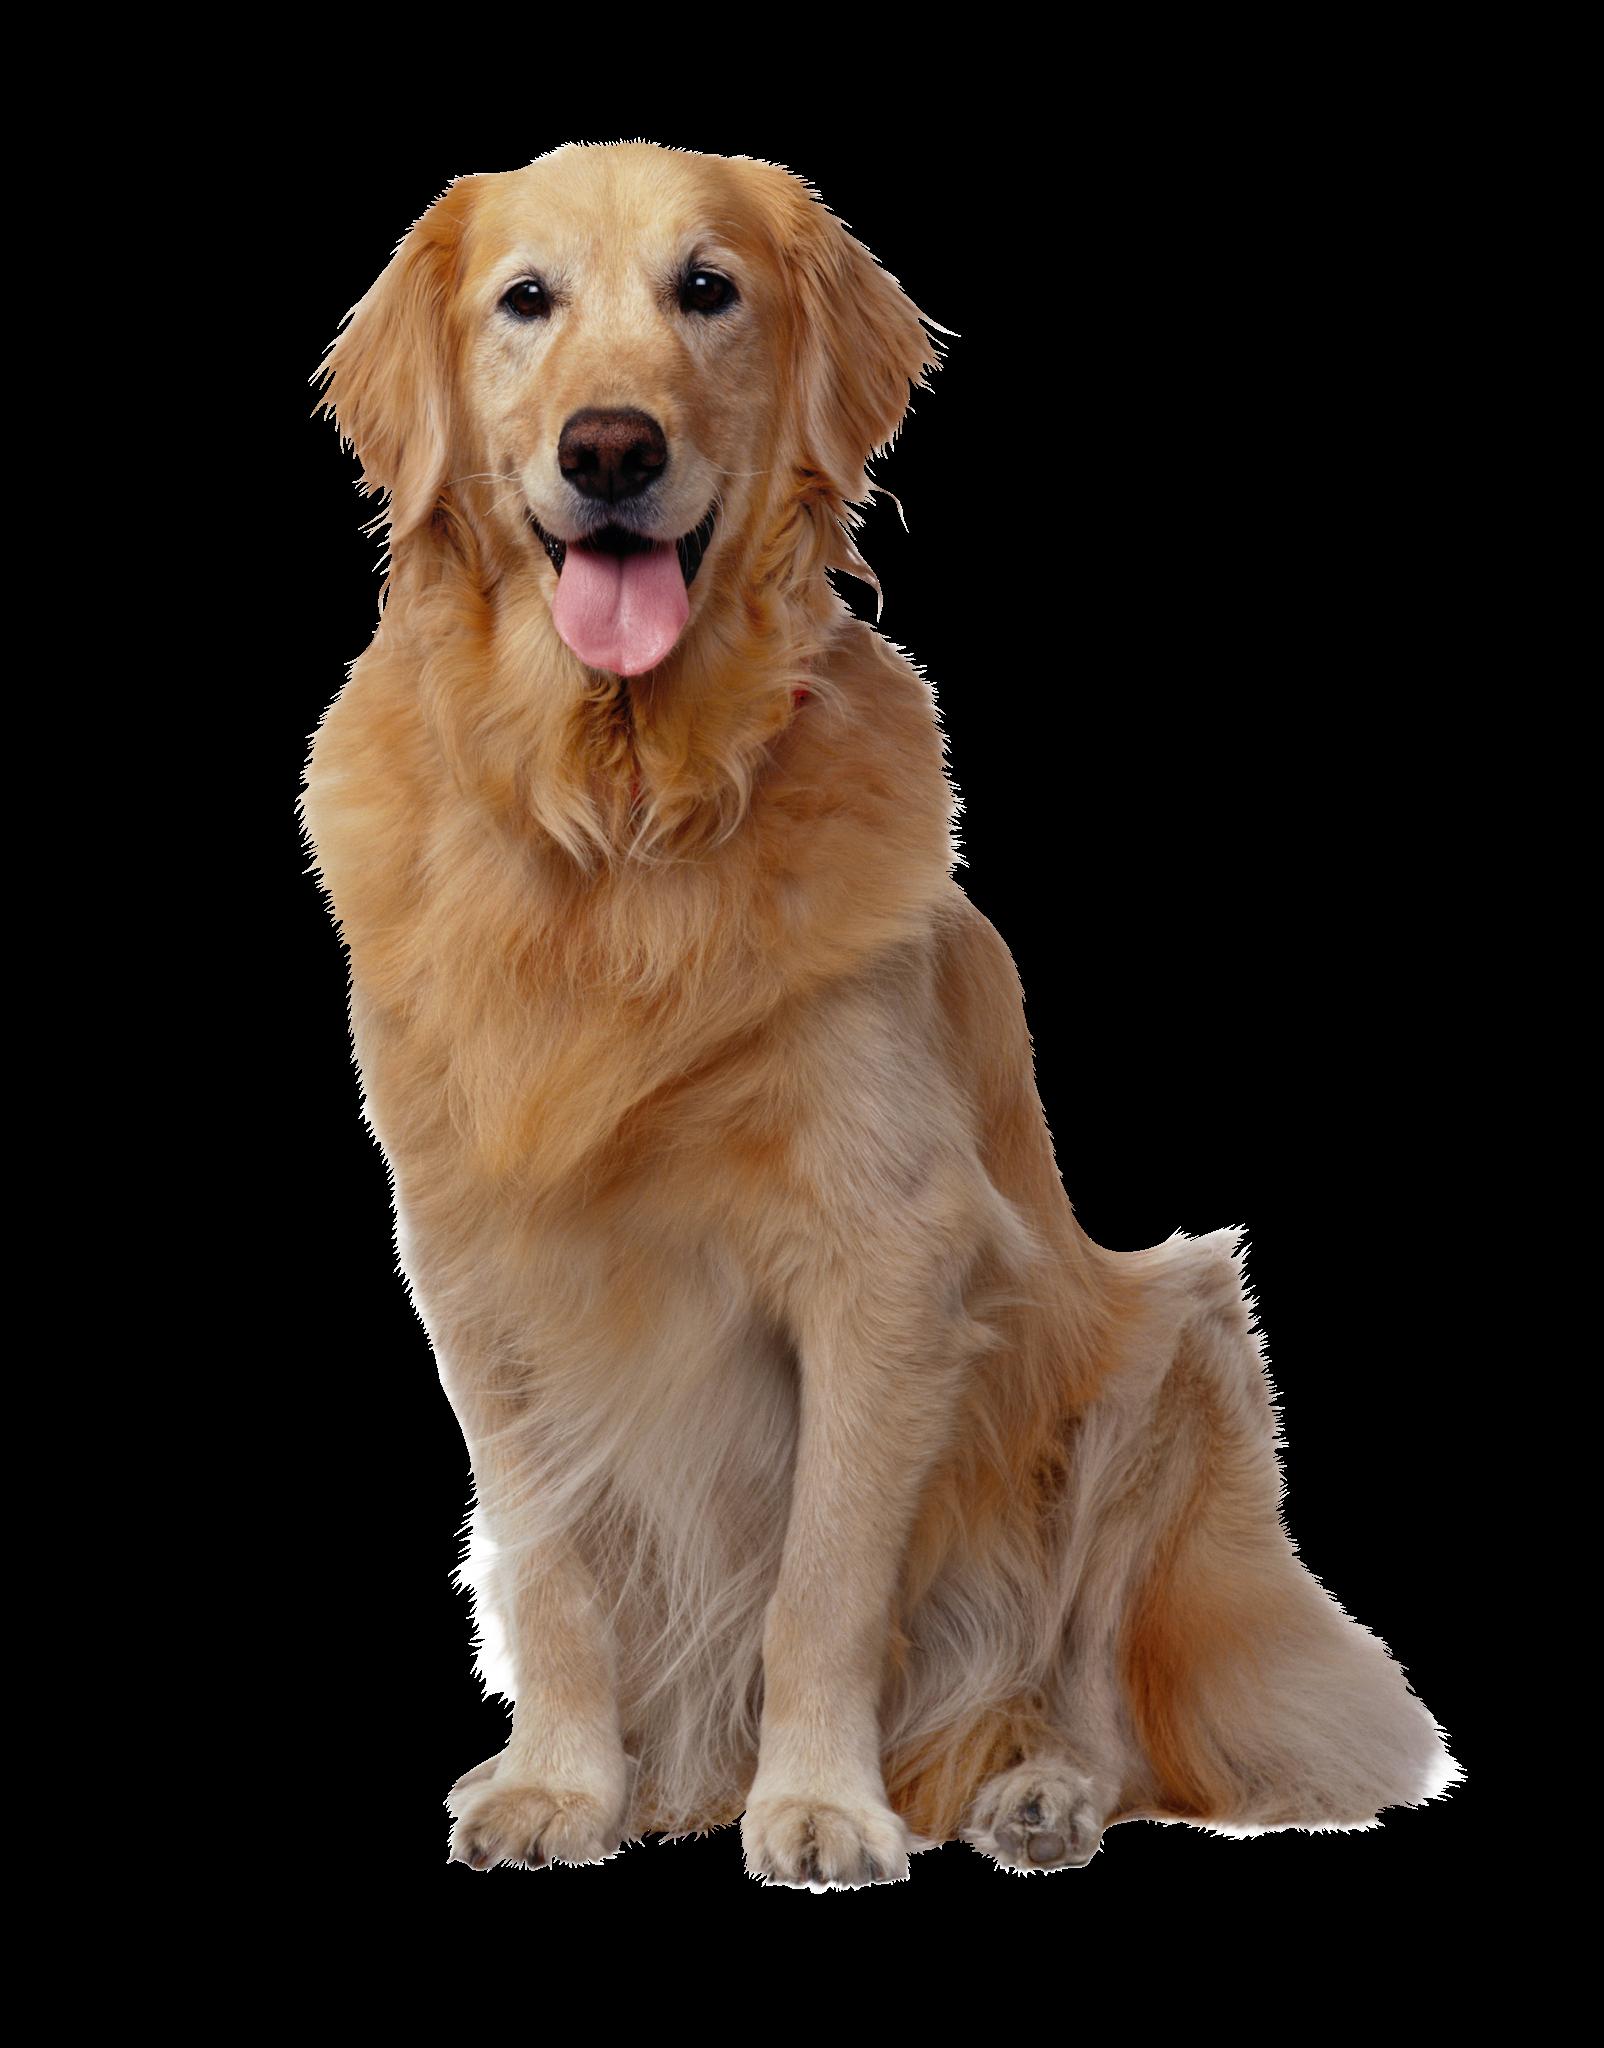 Golden Retriever Puppies Dog Most Popular Dog Breeds Positive Dog Training Popular Dog Breeds